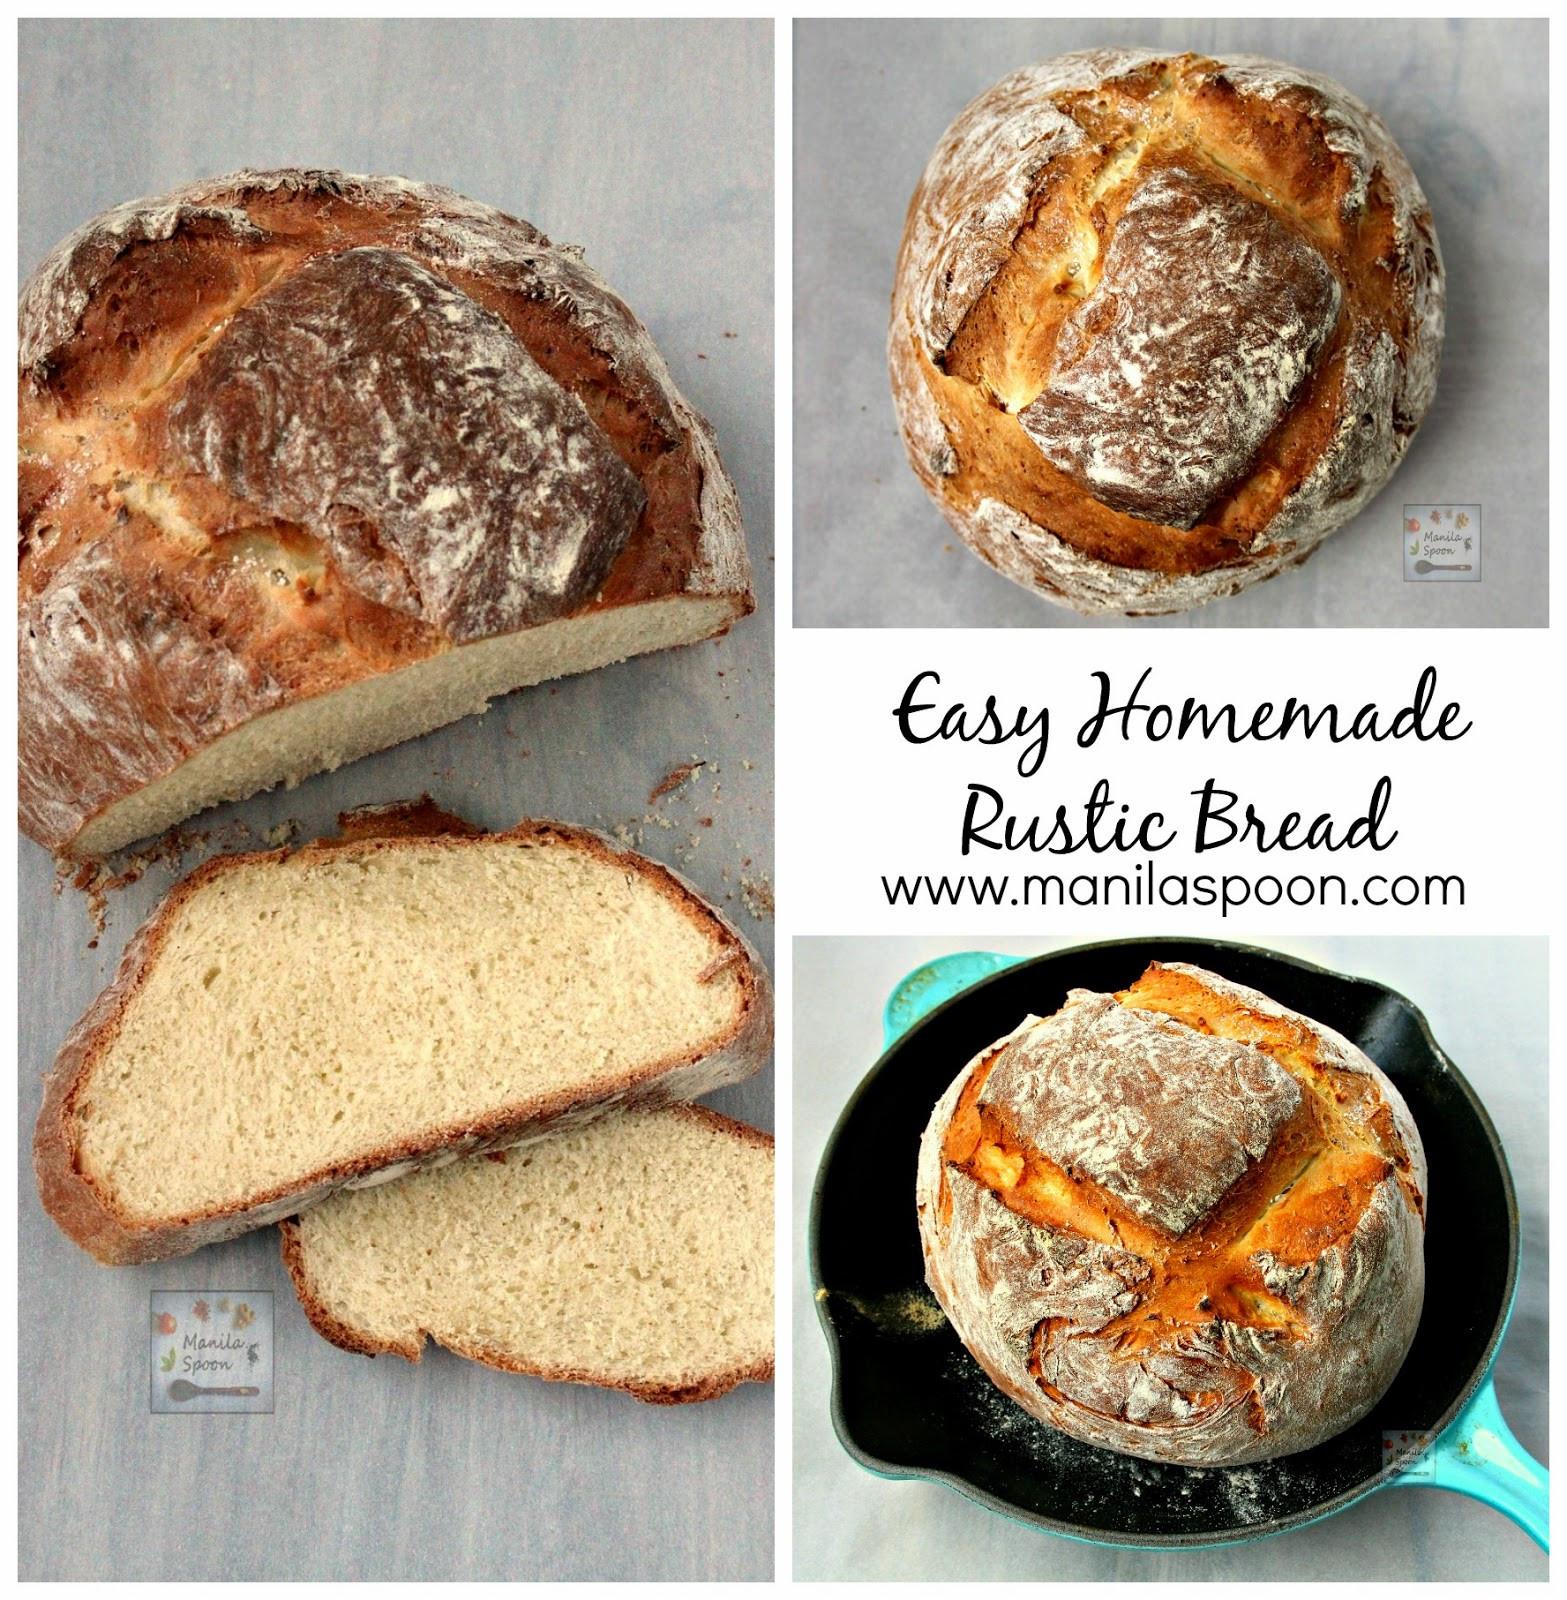 Homemade Bread Recipe  Easy Homemade Rustic Bread Manila Spoon